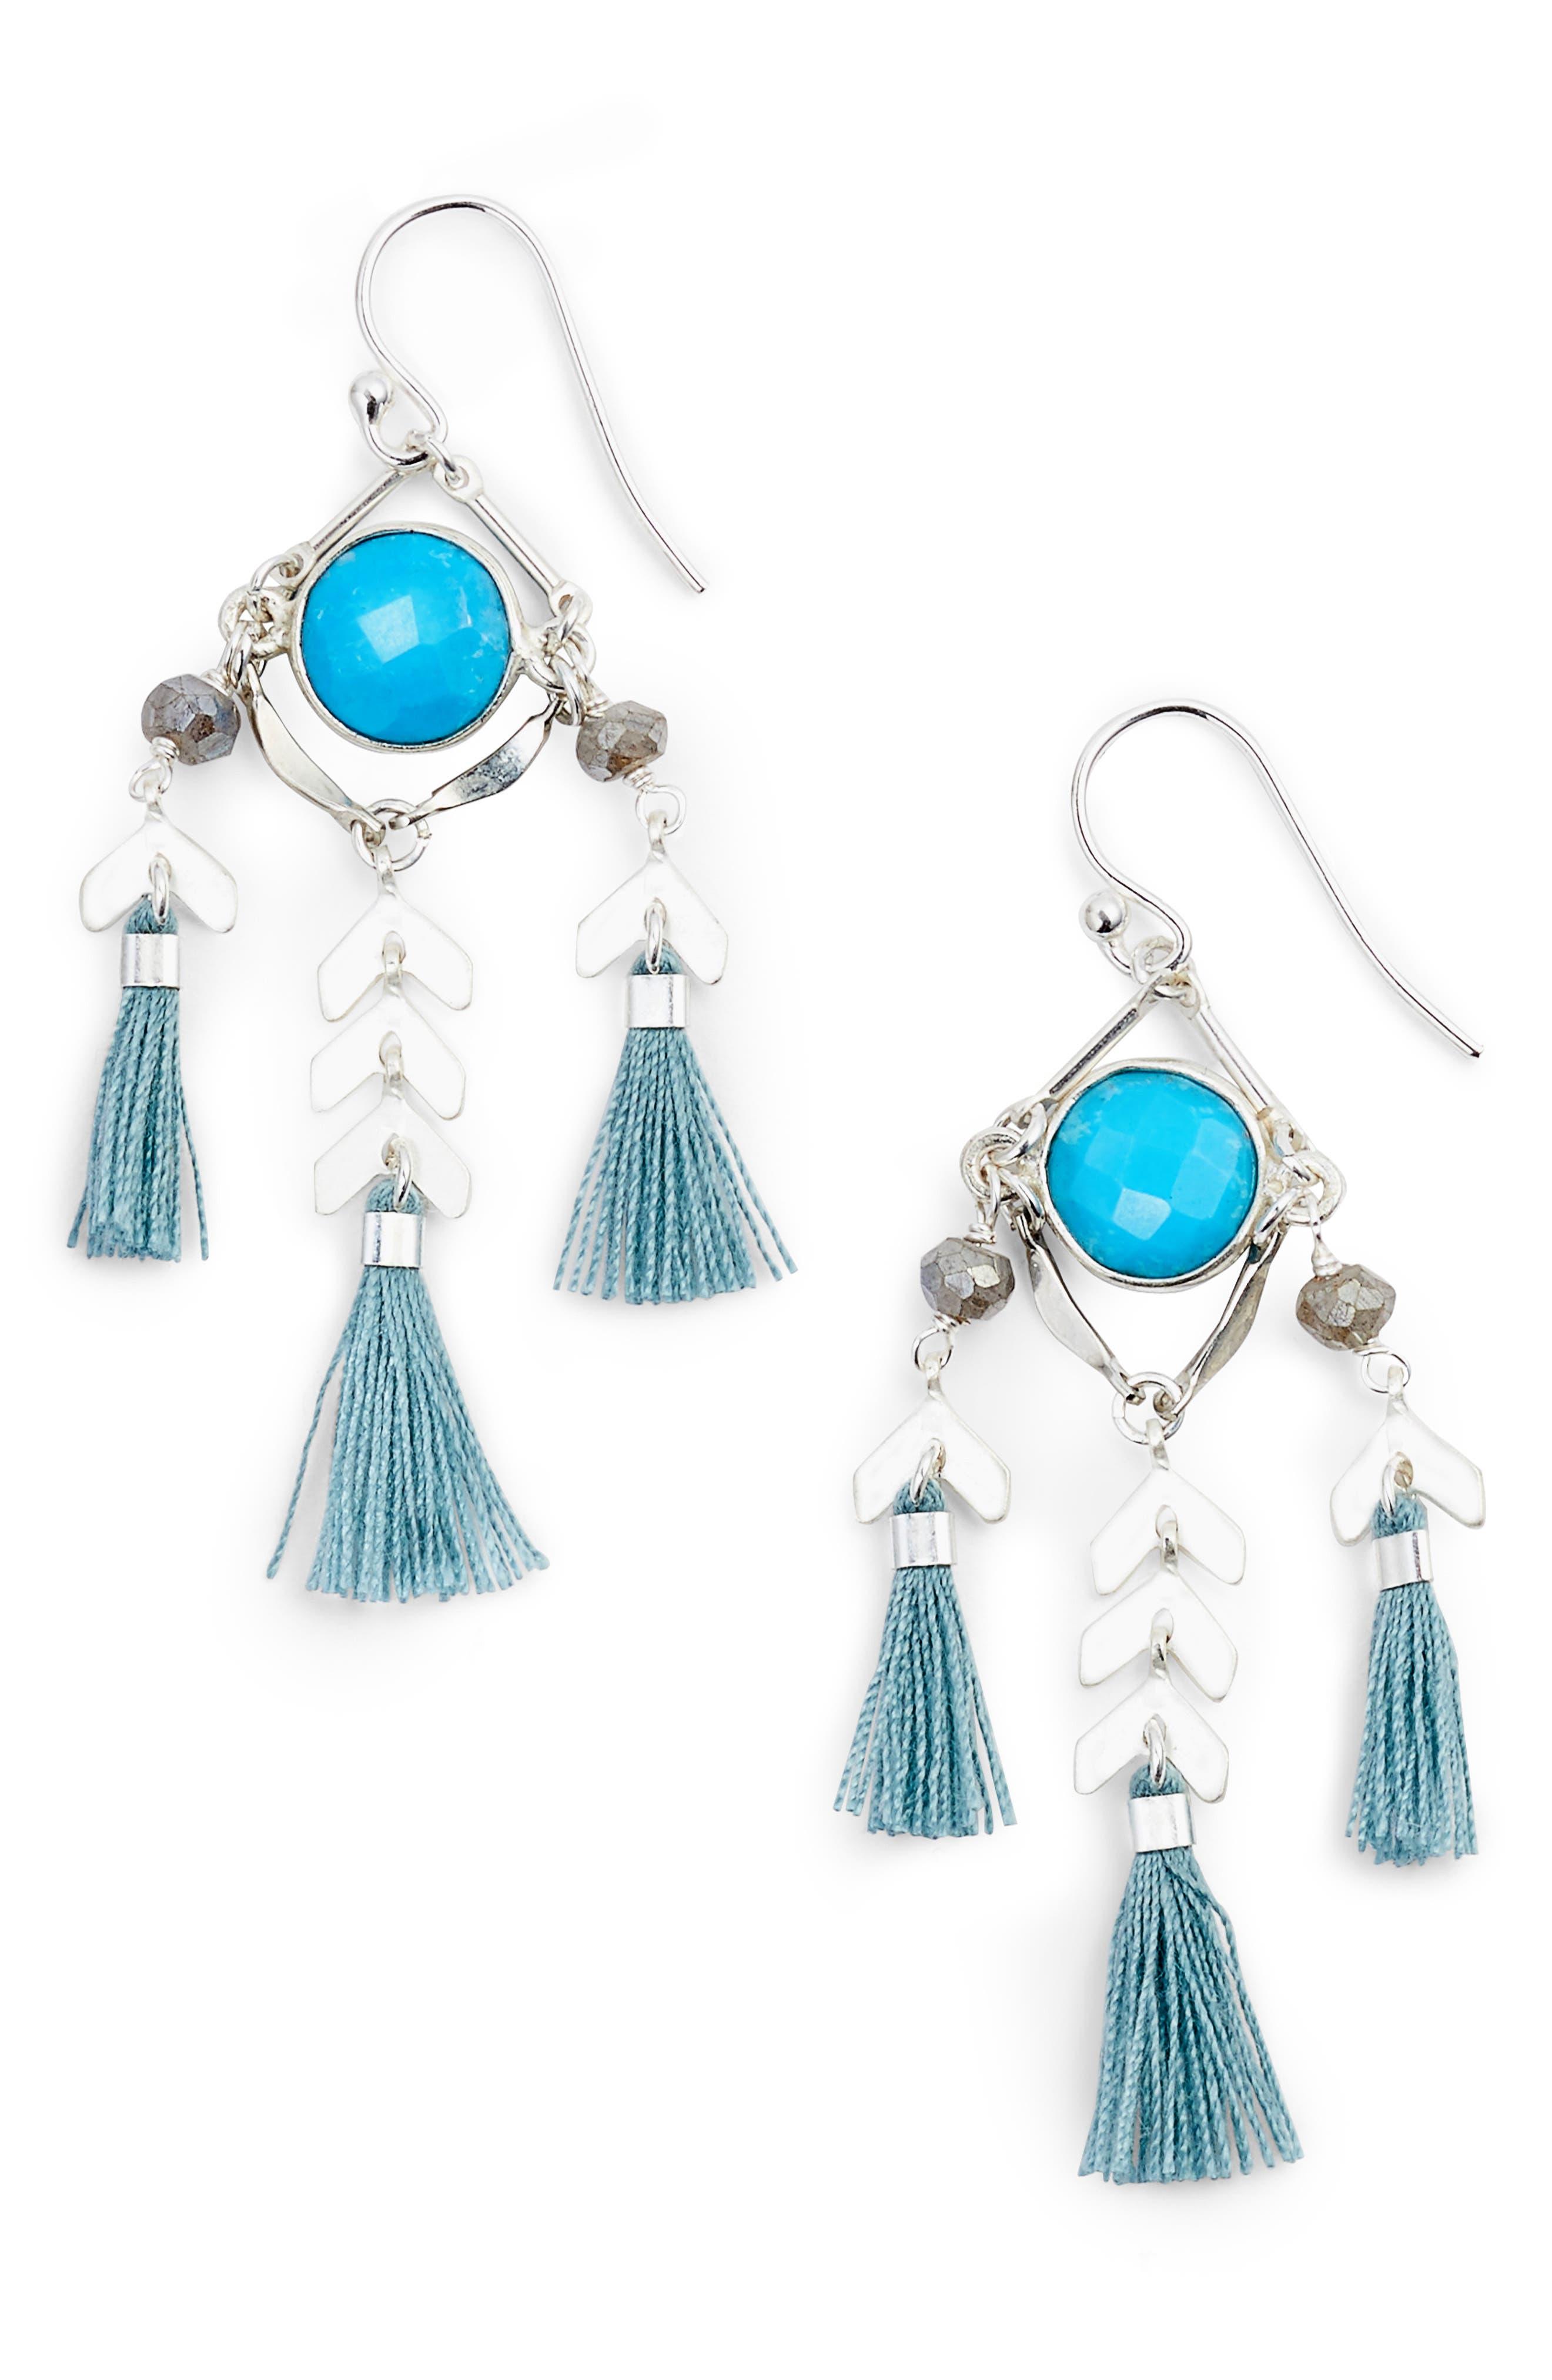 Tassel Drop Earrings,                             Main thumbnail 1, color,                             Turquoise